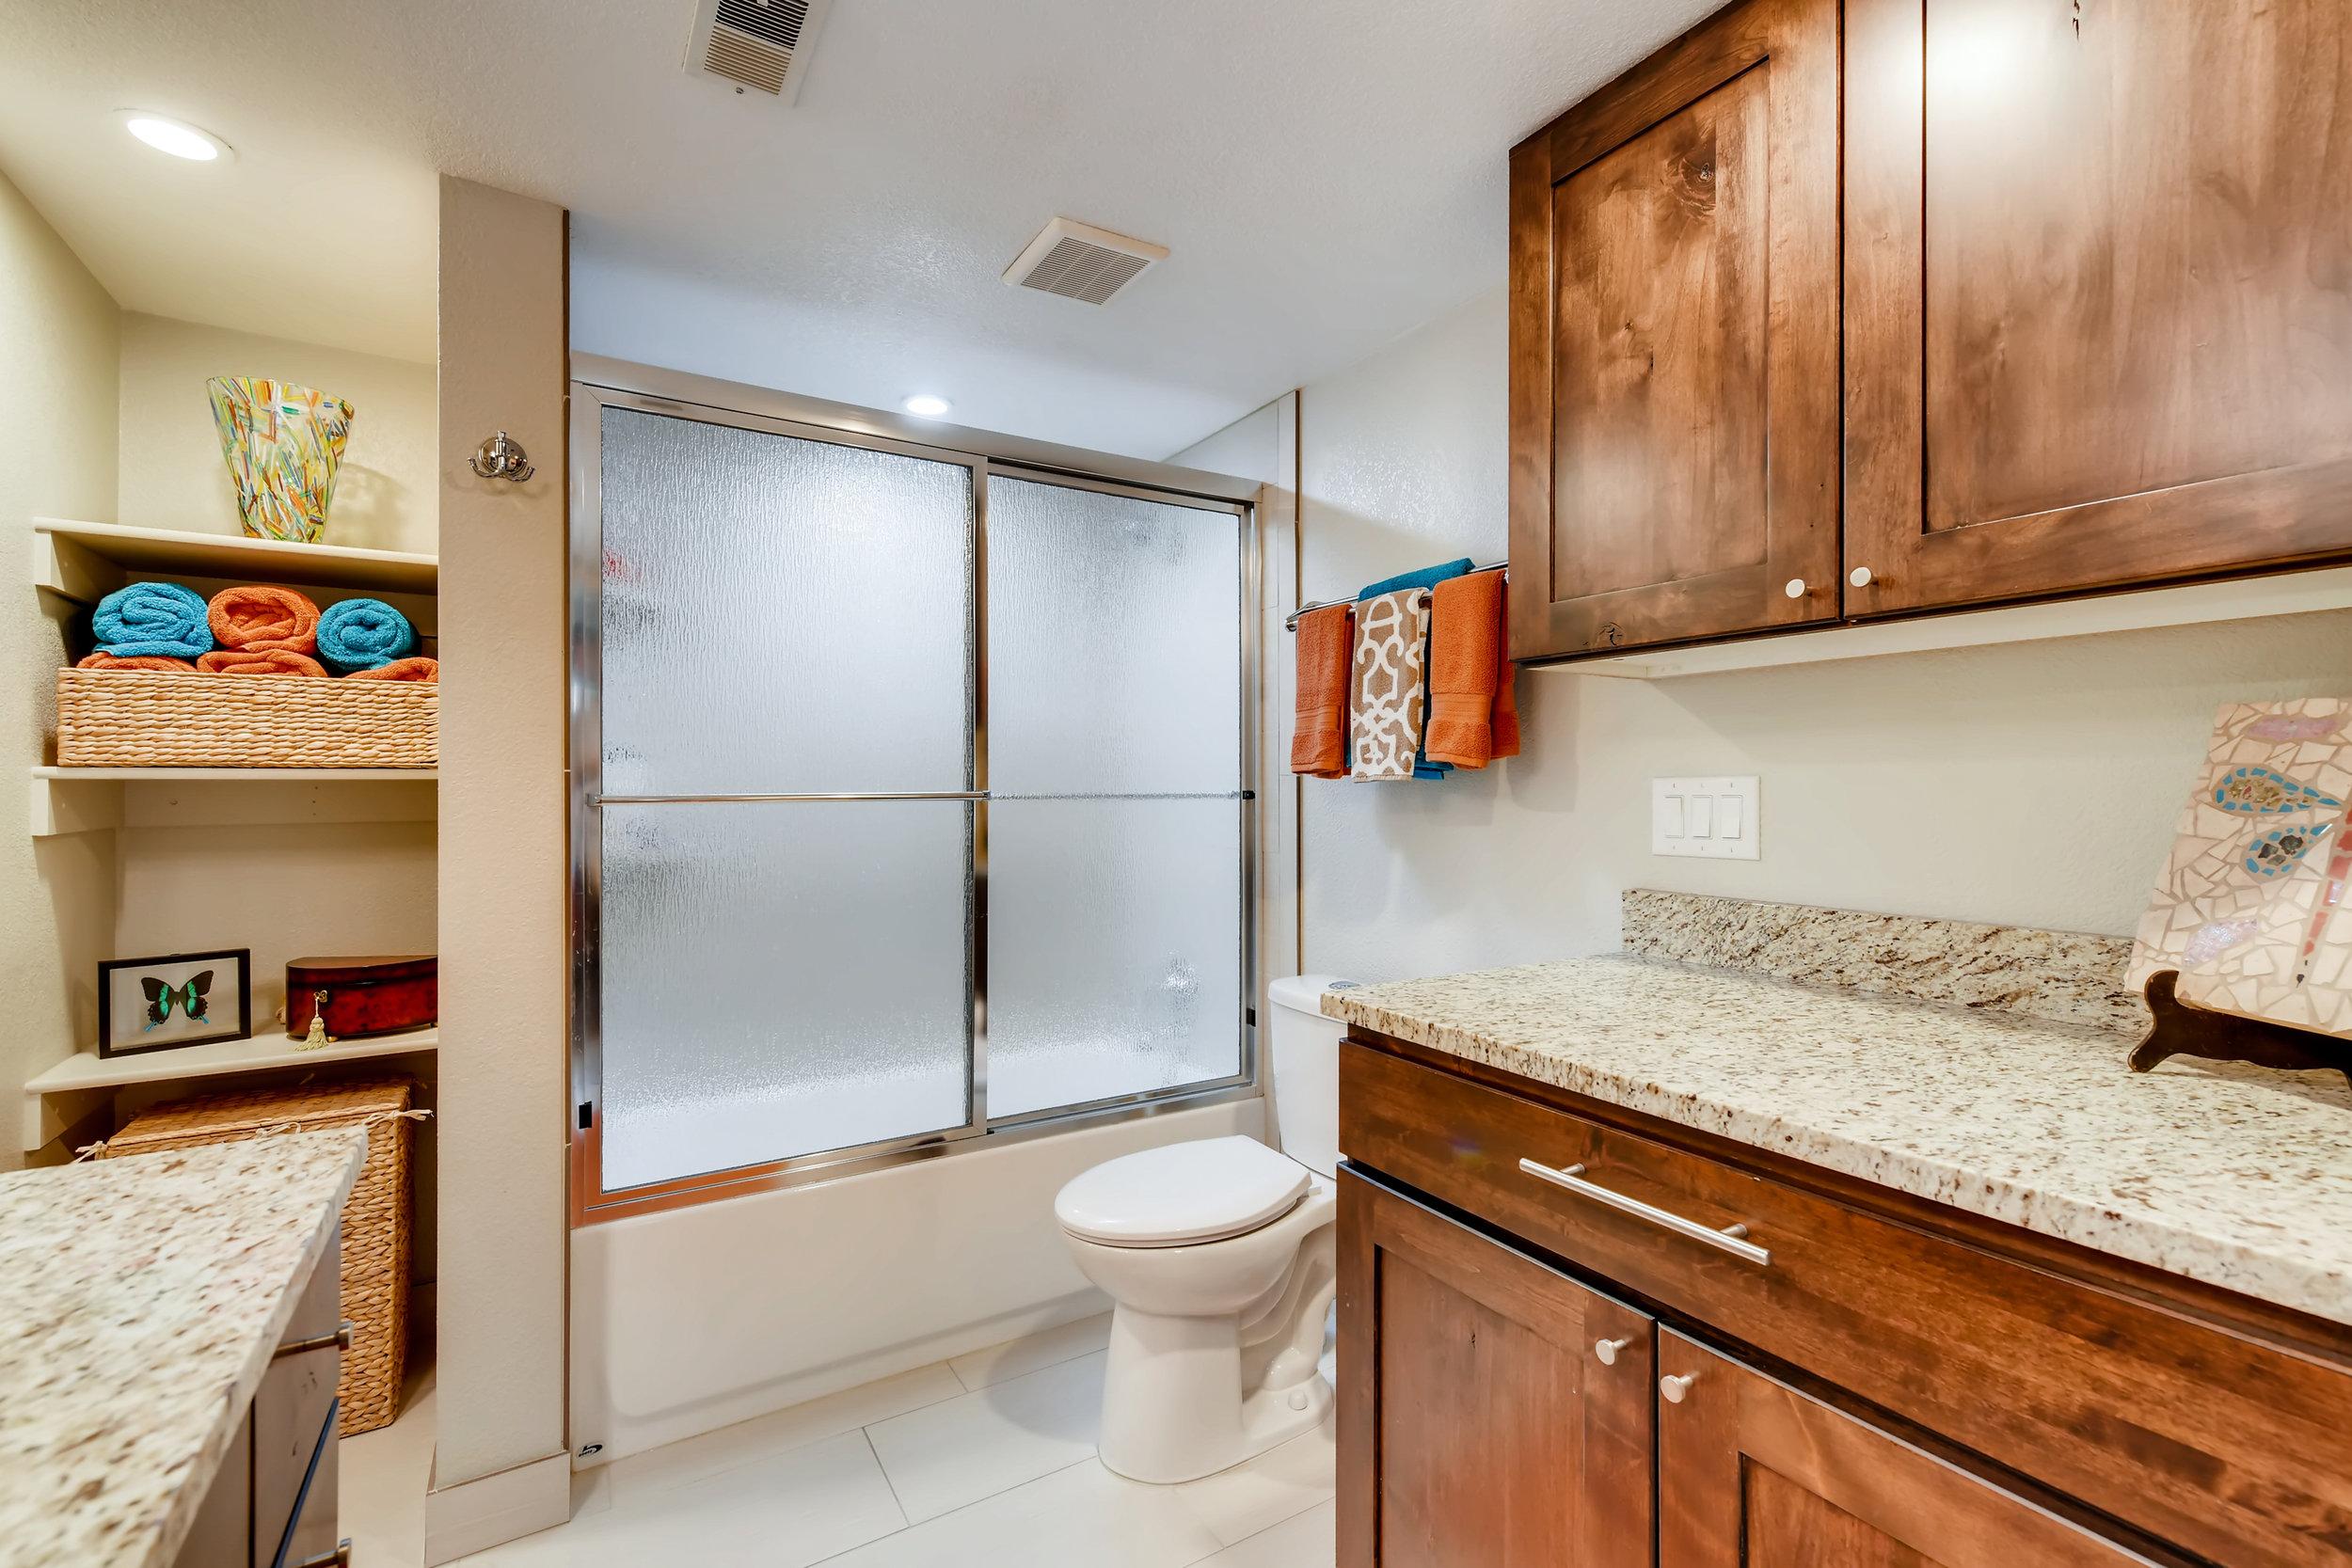 2525 S Deyton Way Unit 1107-print-022-005-Master Bathroom-3600x2400-300dpi.jpg